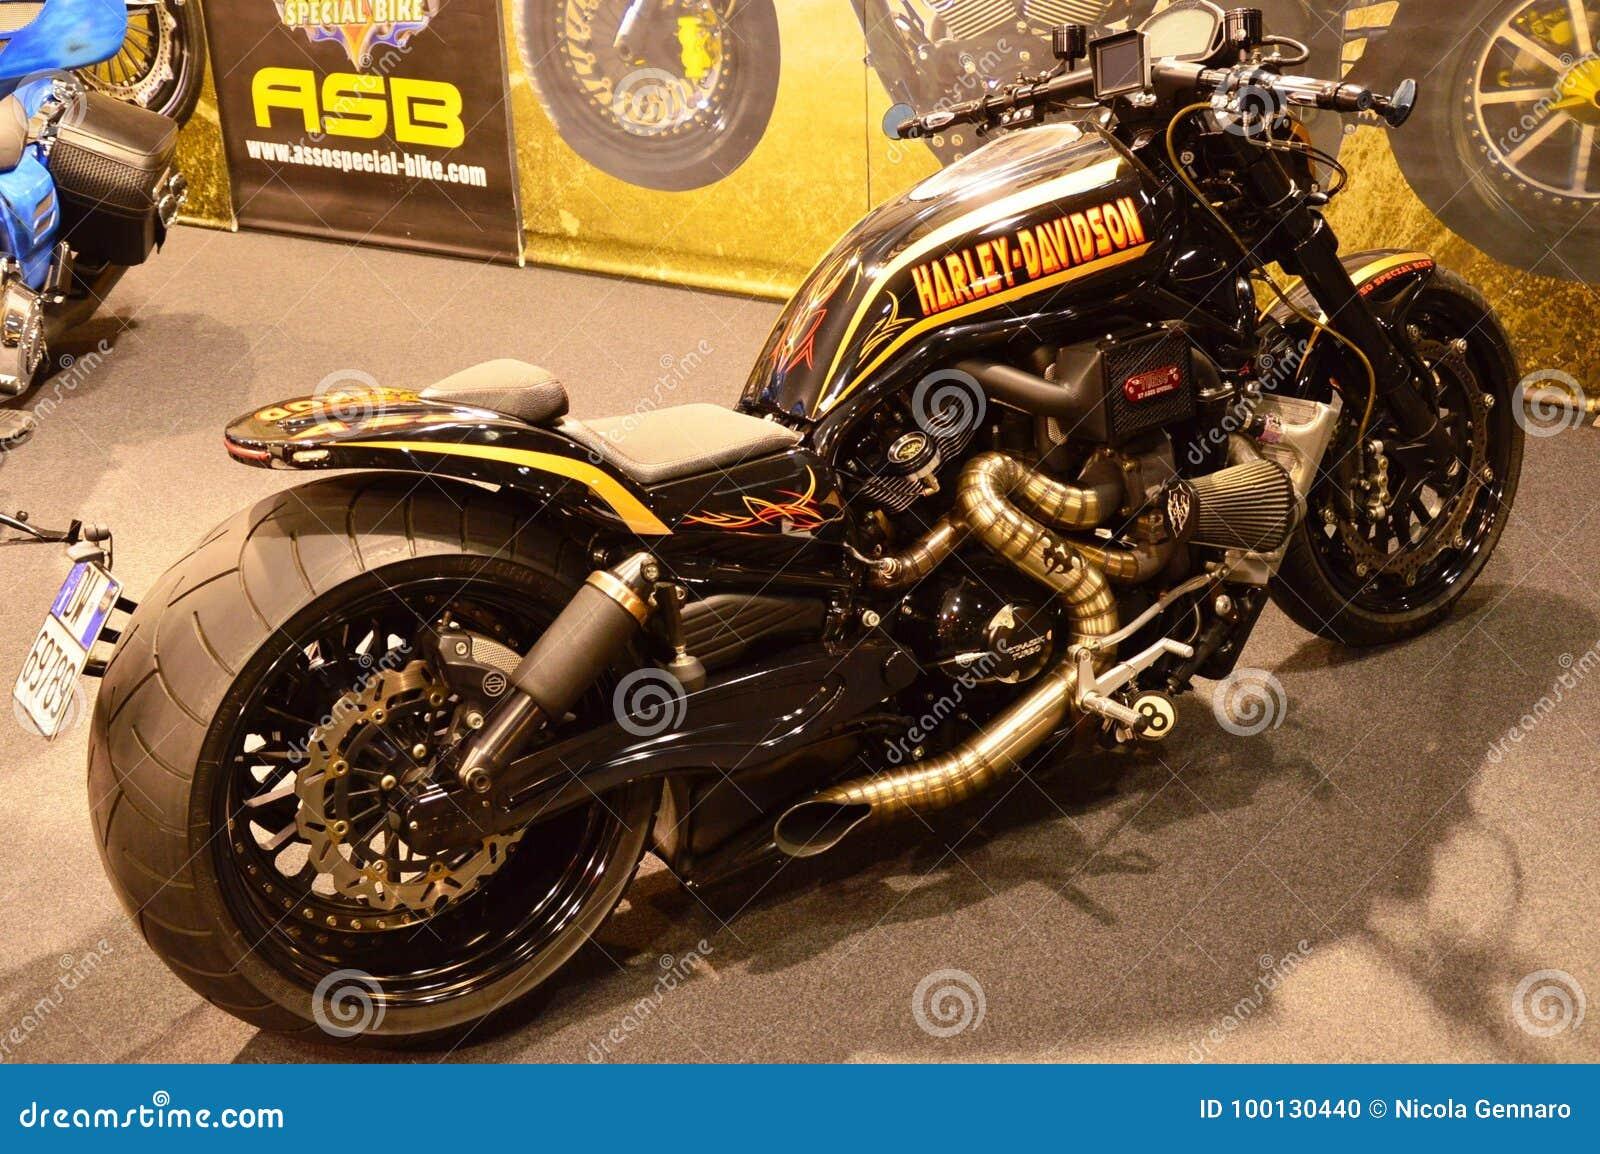 Motor bike expo, motorbike Harley Davidson